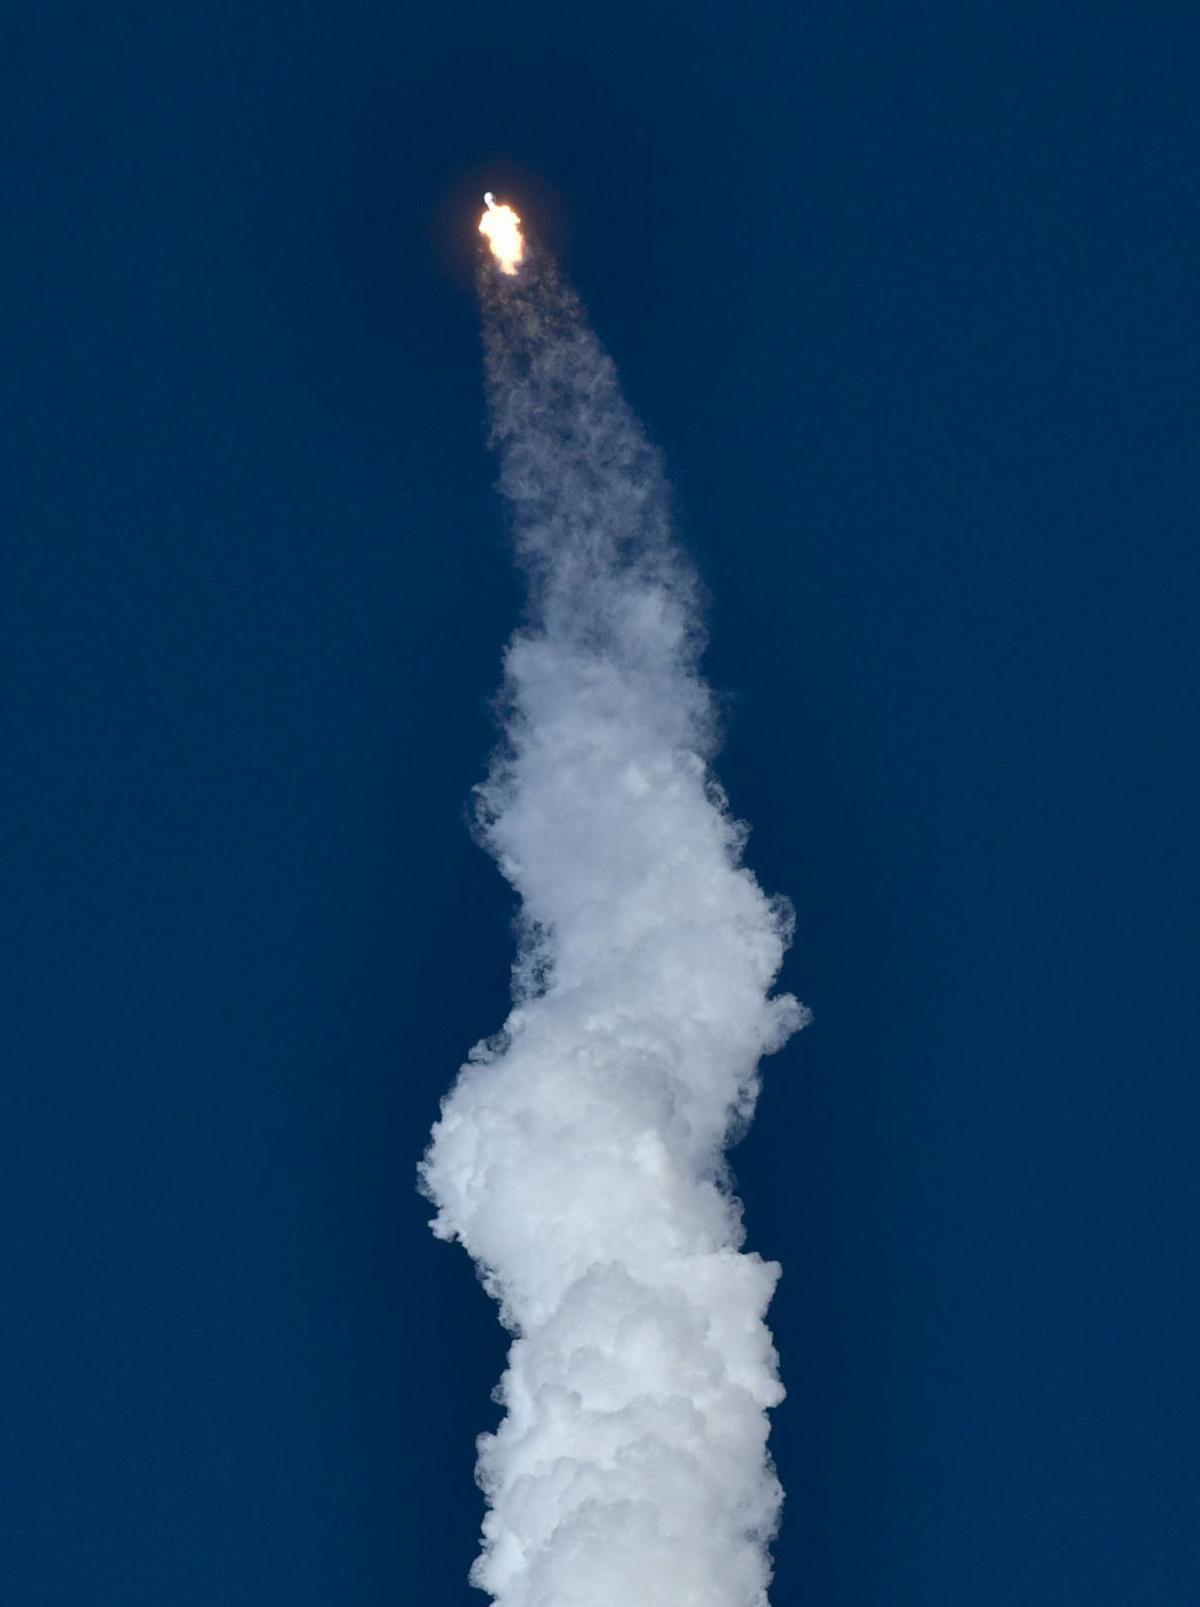 033018 SpaceX Iridium launch 13.jpg (copy)